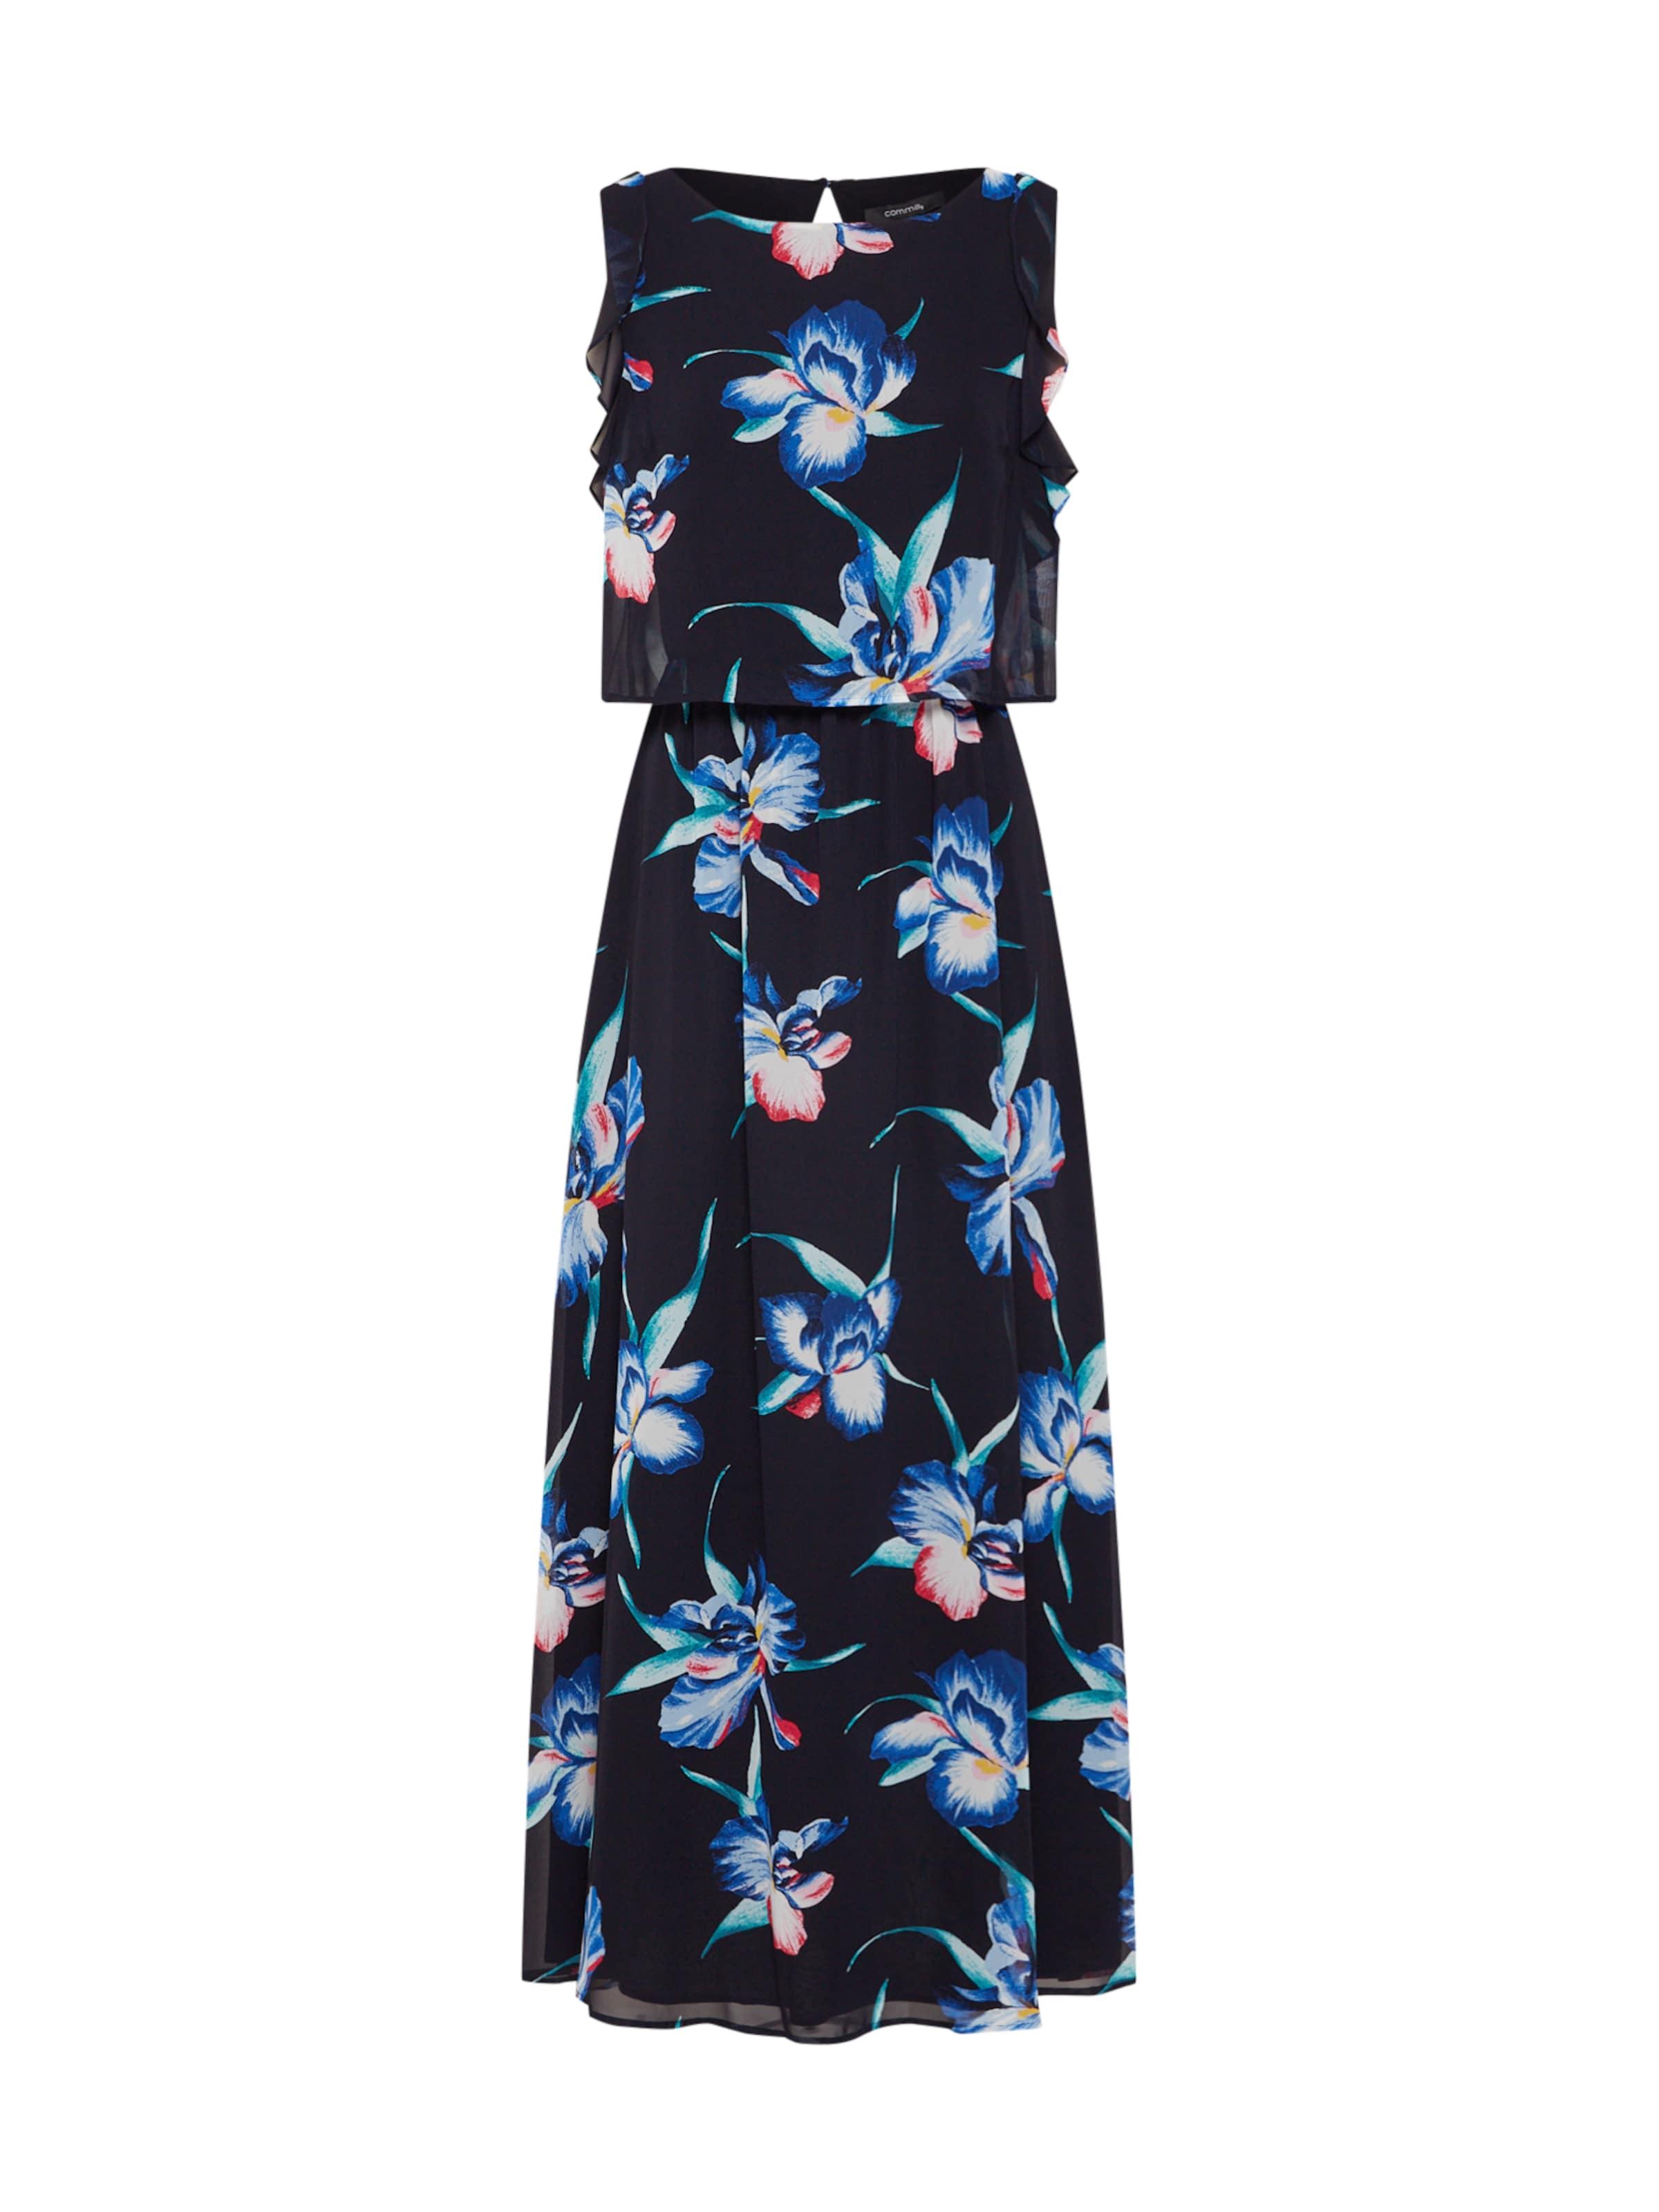 DunkelblauMischfarben In Kleid Kleid Kleid DunkelblauMischfarben DunkelblauMischfarben In Comma In Comma Comma NXnP8O0wk